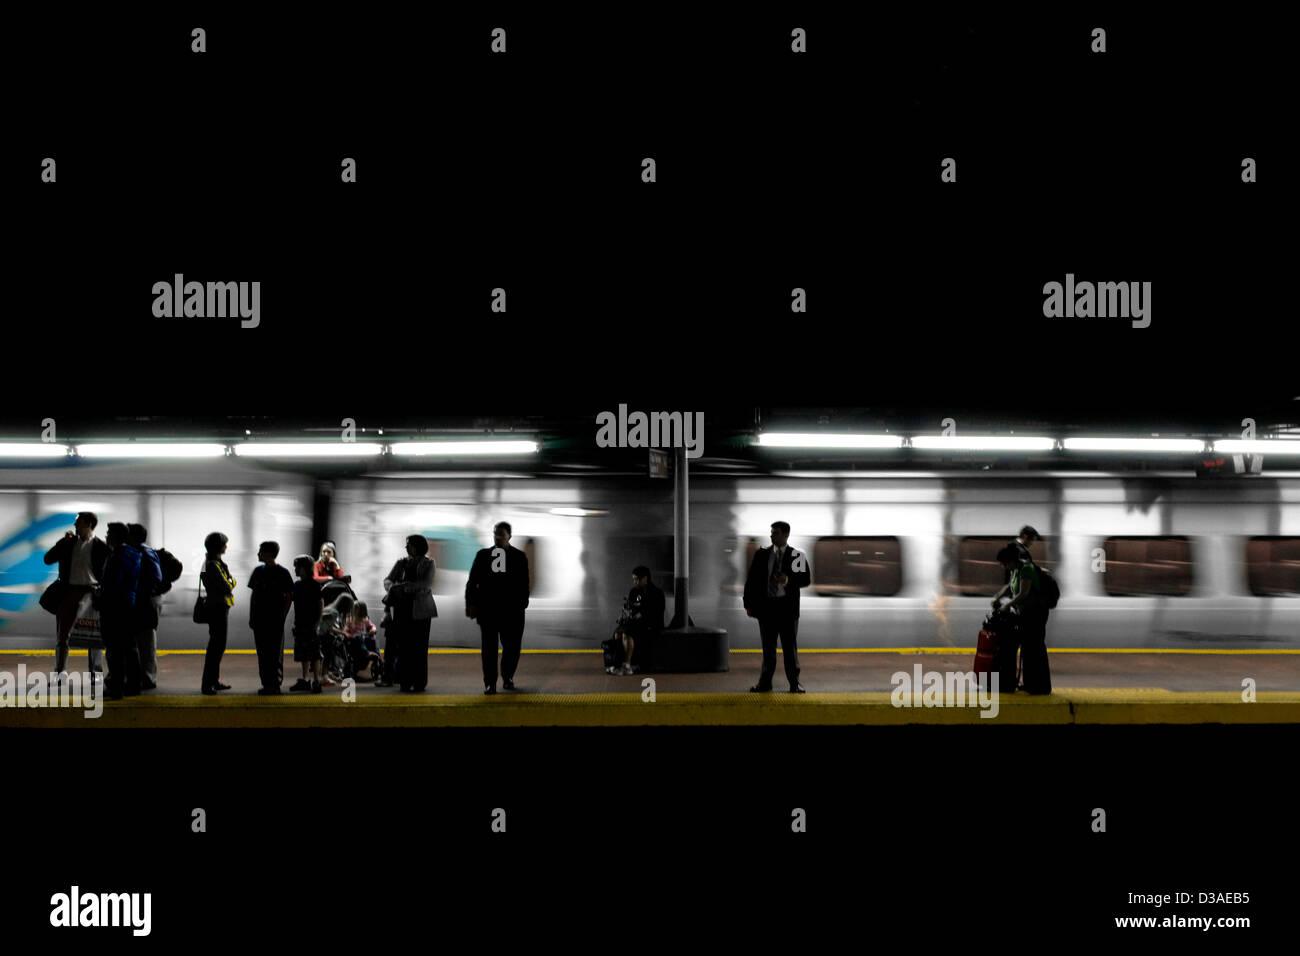 Subterranean commuters. - Stock Image